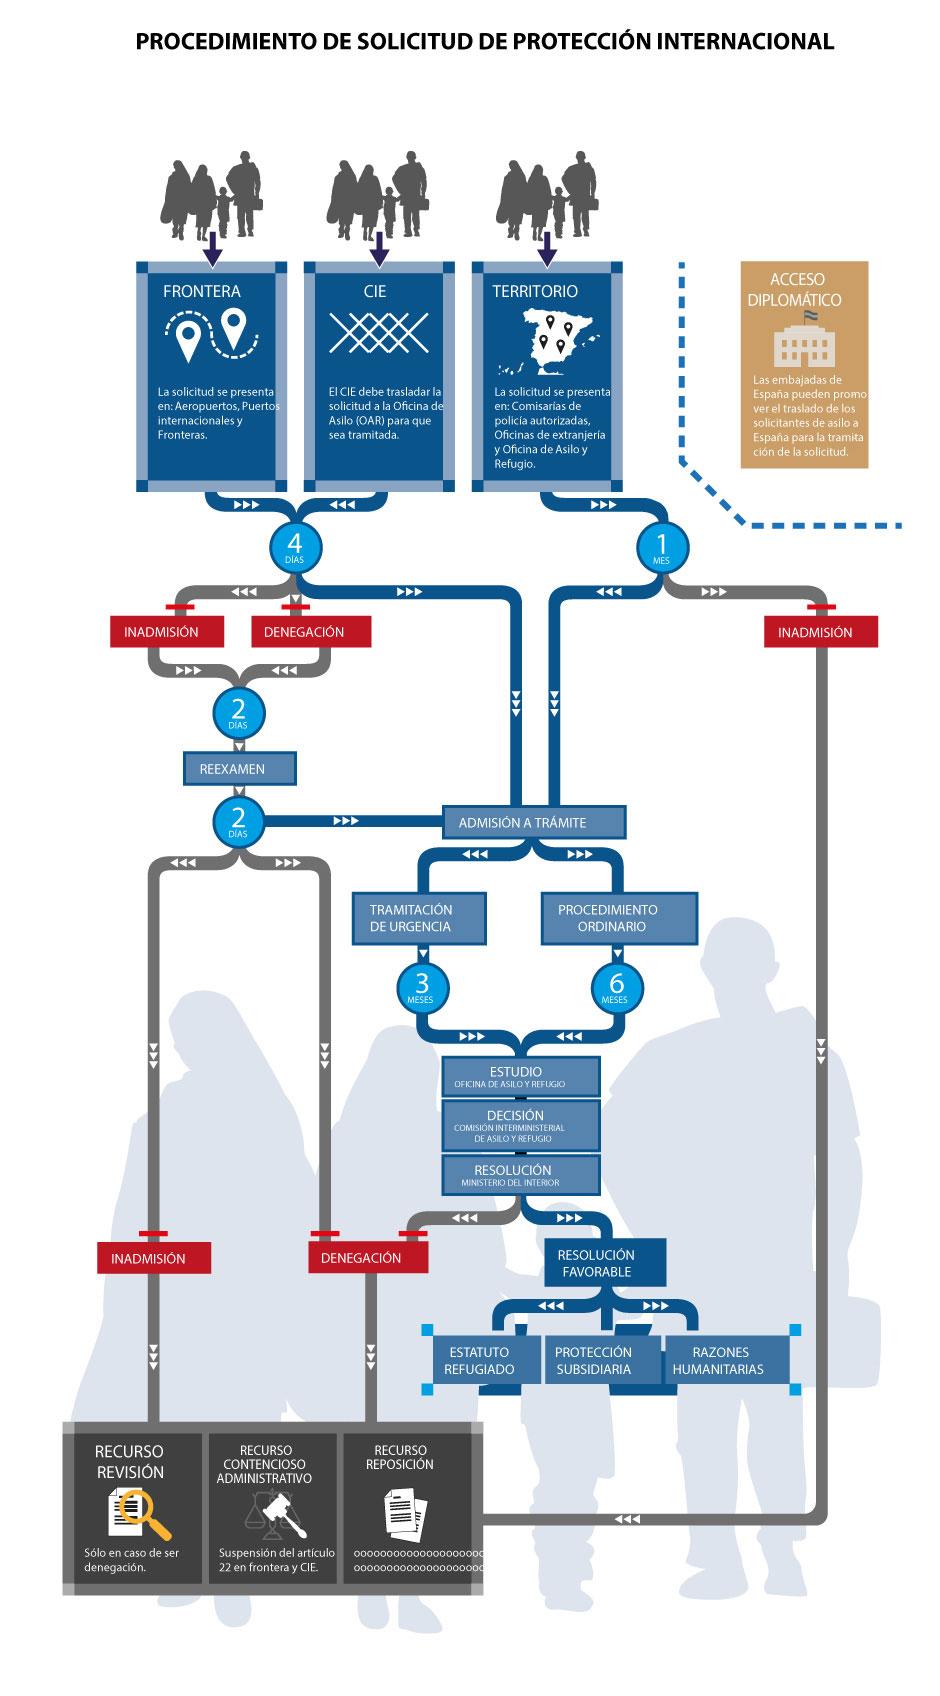 Procedimiento-Asilo-infografia